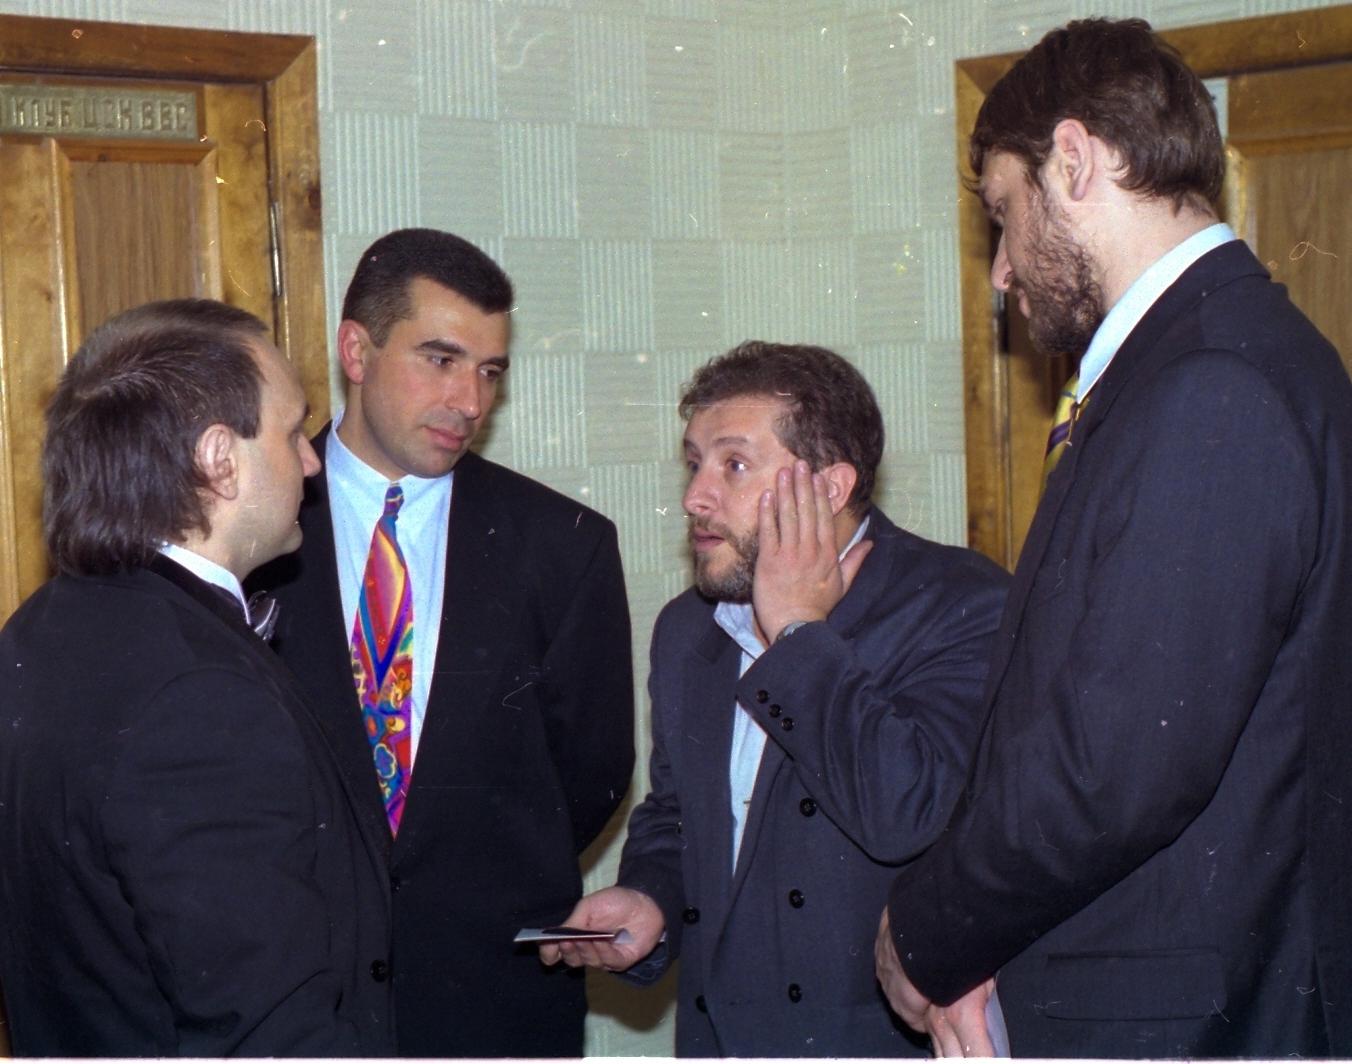 Князев, Аветисян, Добрусин, Фейгин